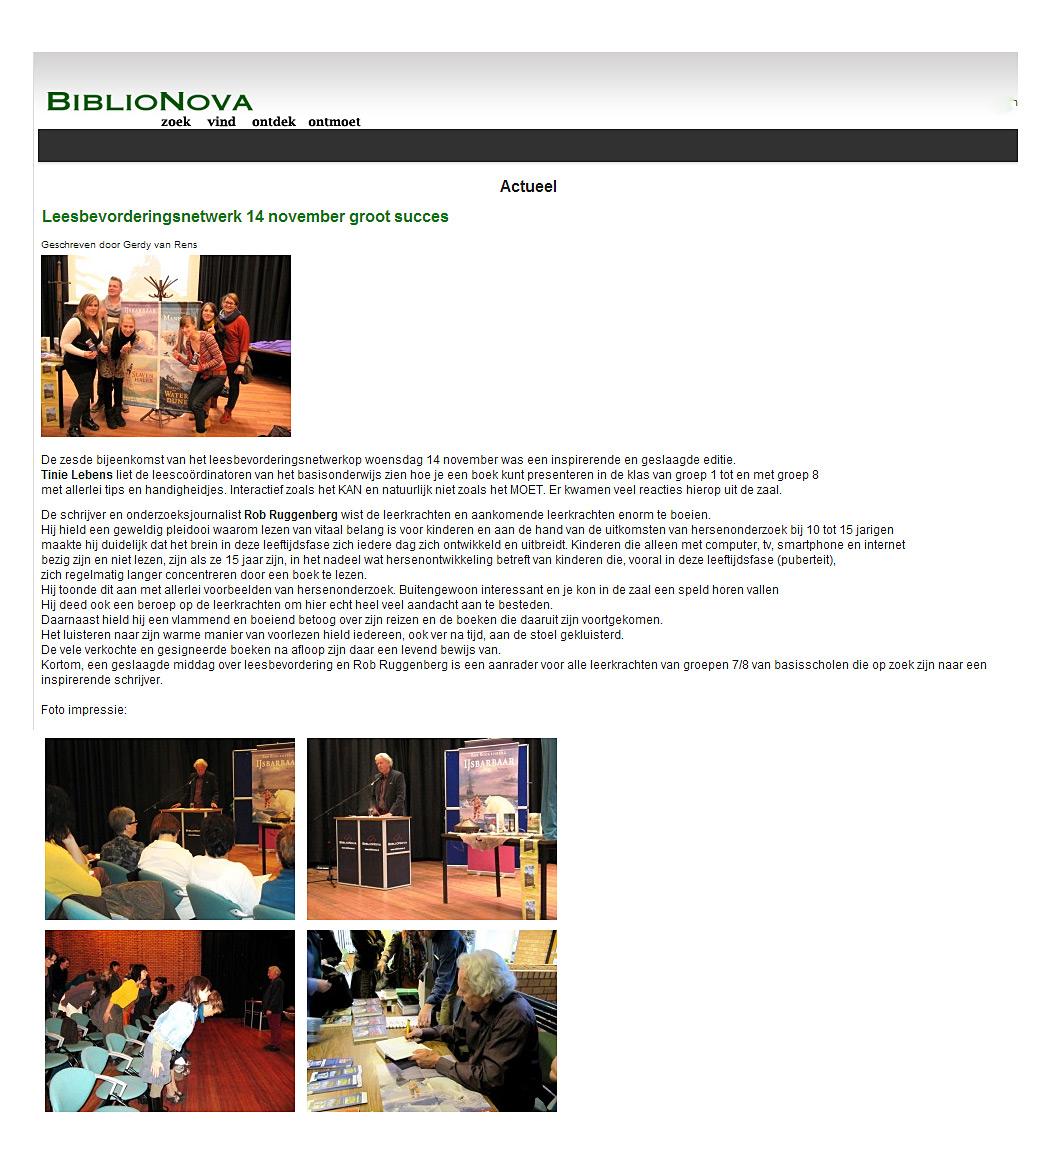 Verslag lezing bij BiblioNova